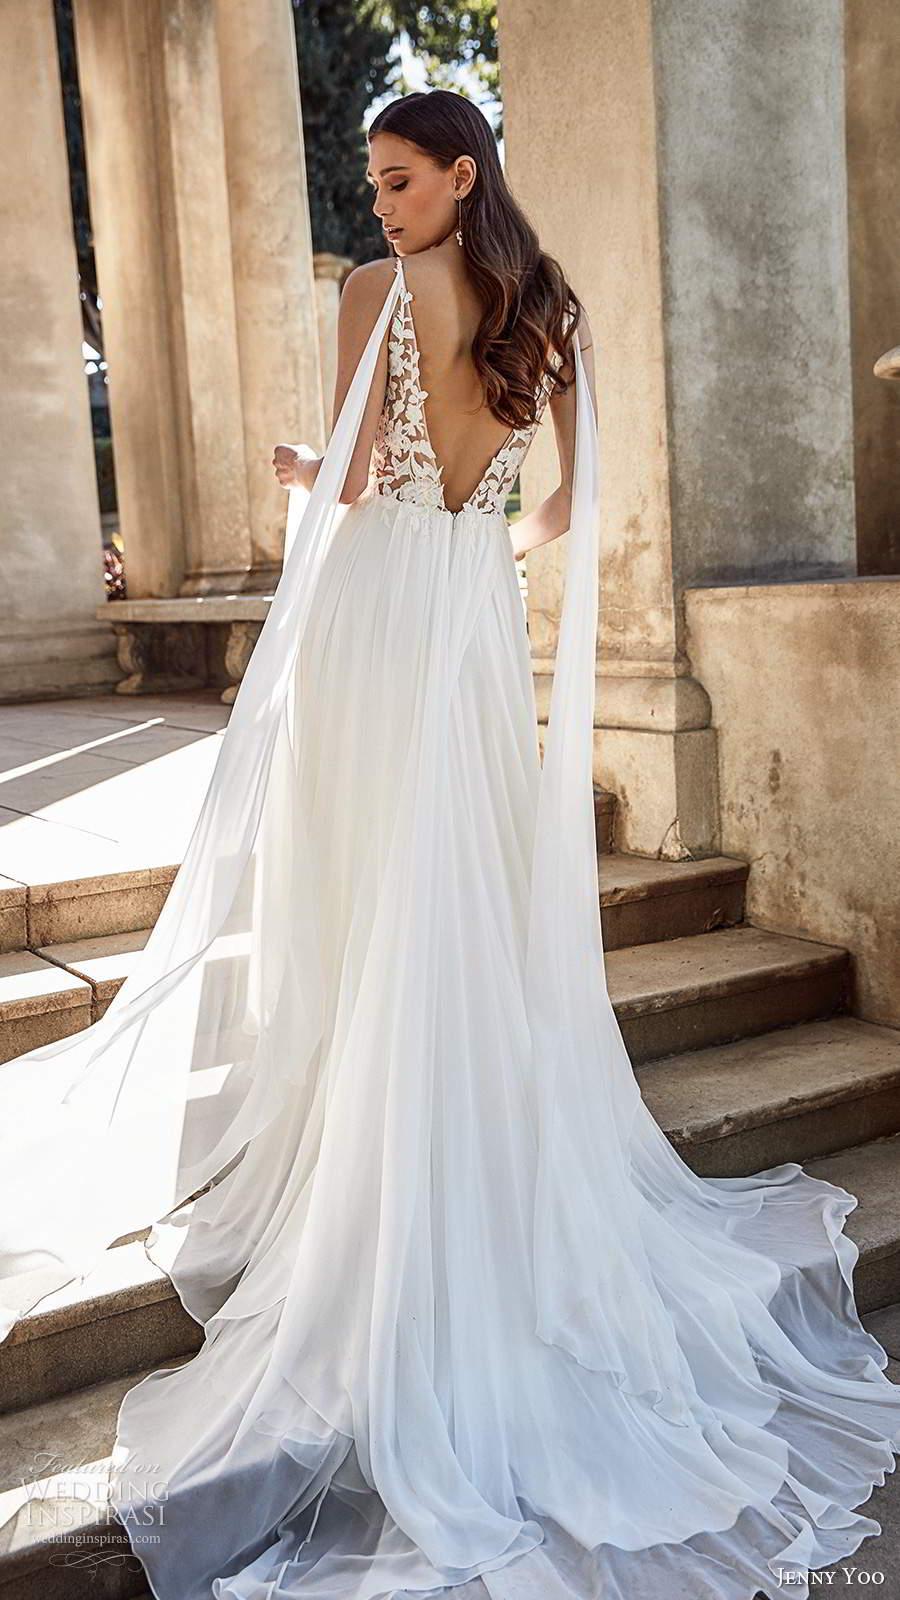 jenny yoo spring 2020 bridal sleeveless straps plunging v necklie embellished bodice clean skirt a line ball gown wedding dress v back chapel train (4) zv